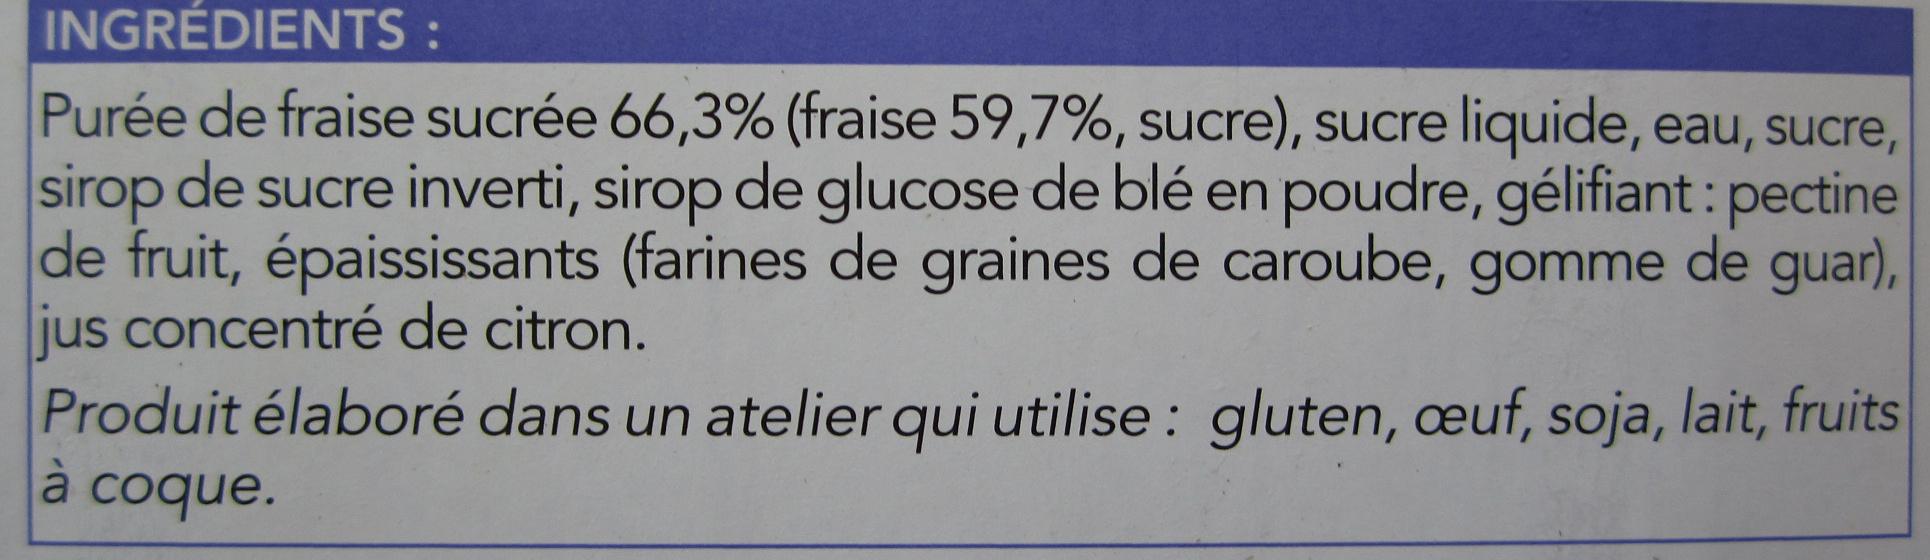 La fraise - Ingredients - fr